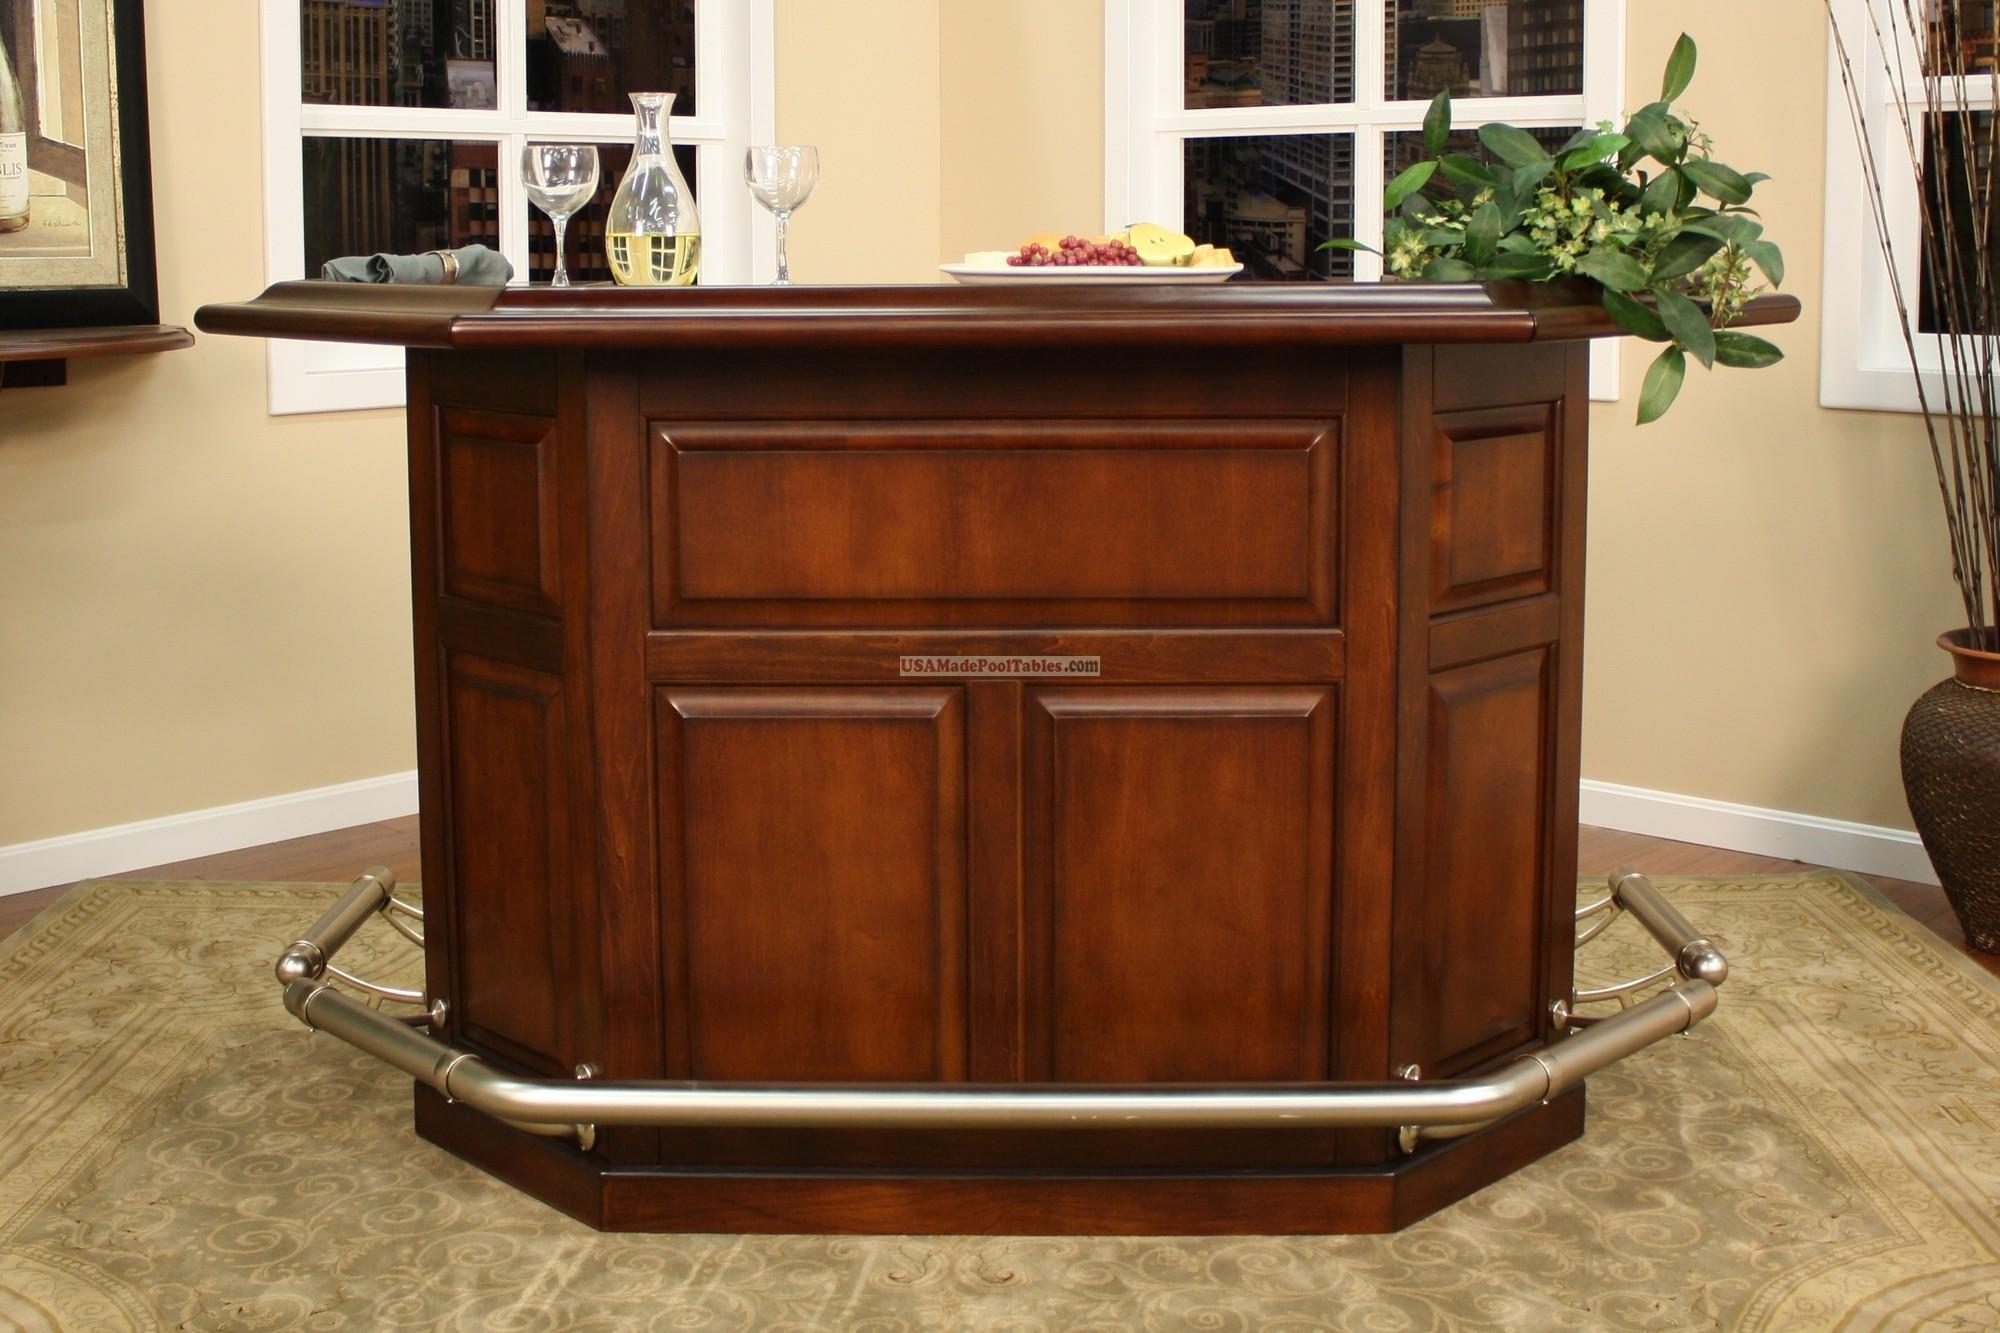 Home bar furniture Home bar: Bars: Furniture PPXUKKC